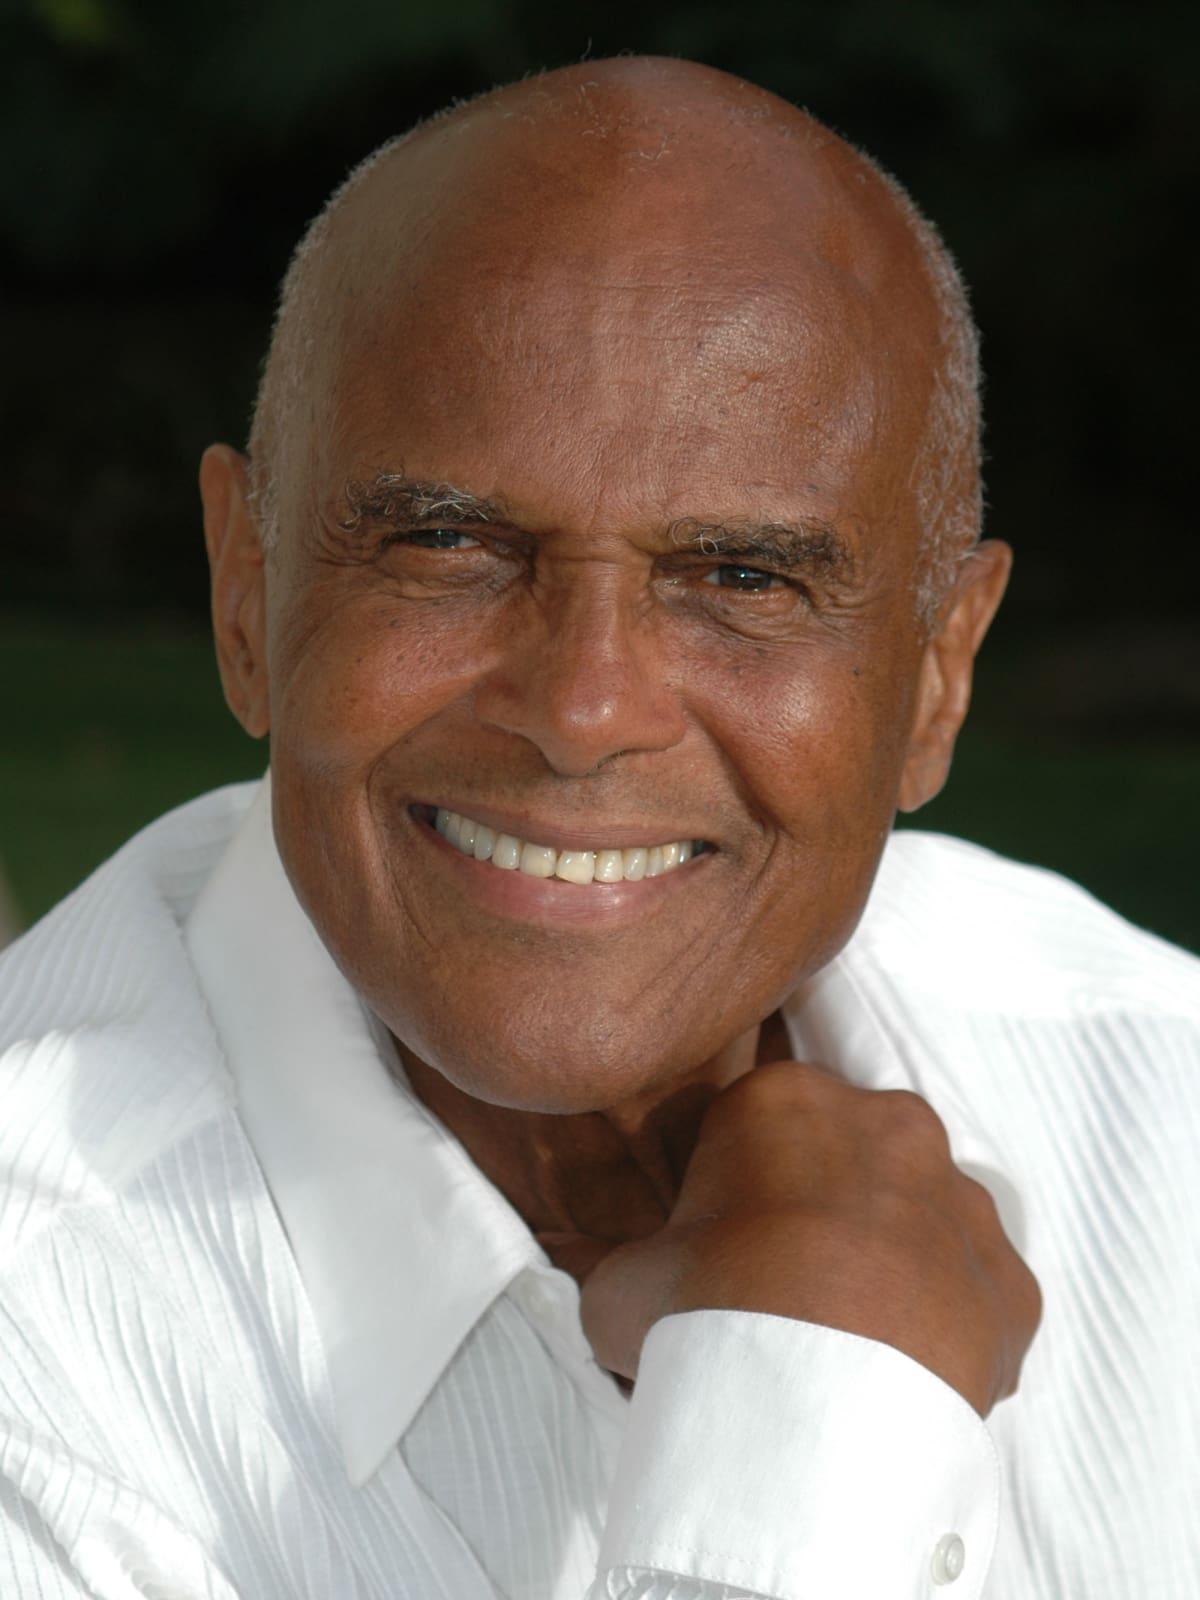 Brilliant Lecture Series: Harry Belafonte